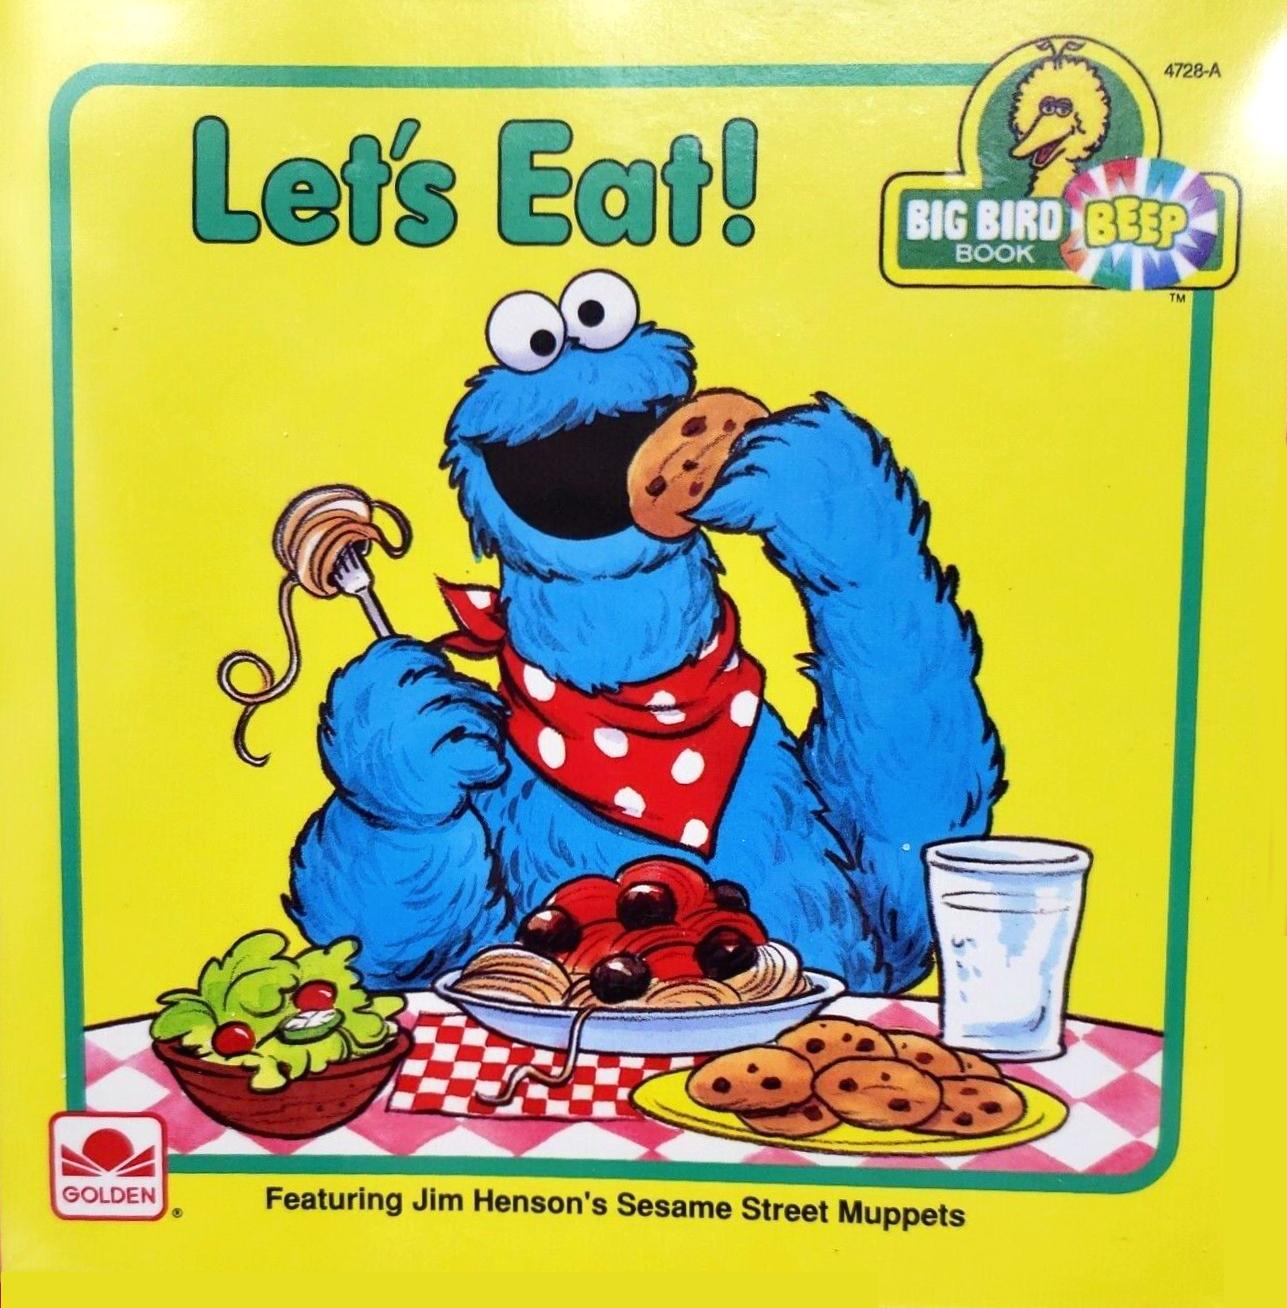 File:Big bird beep let's eat.jpg